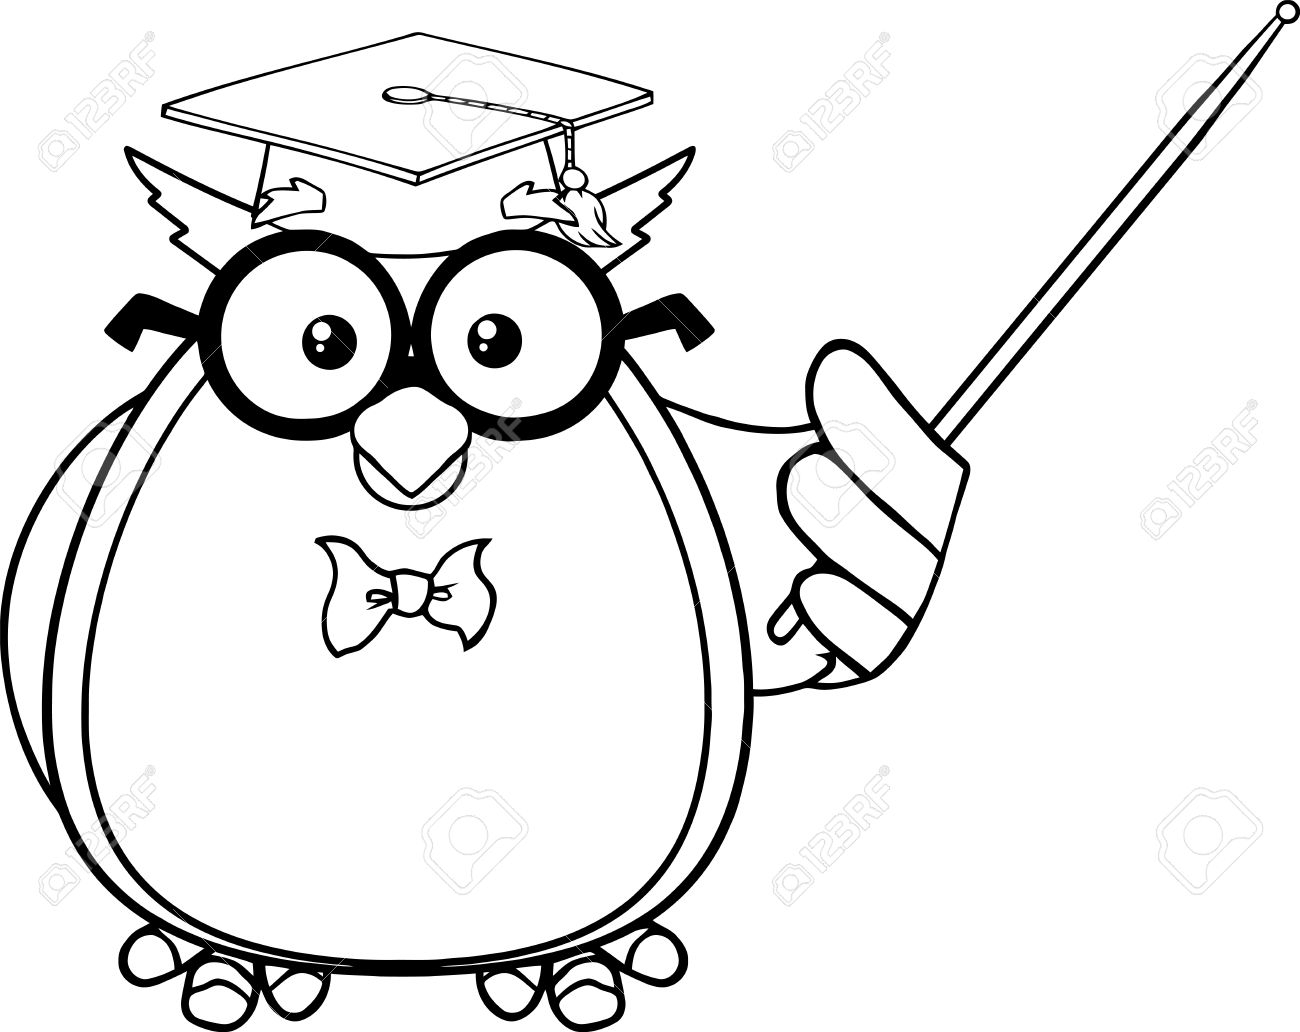 1300x1032 Teacher Cartoon Drawing School Teacher Drawing At Getdrawings